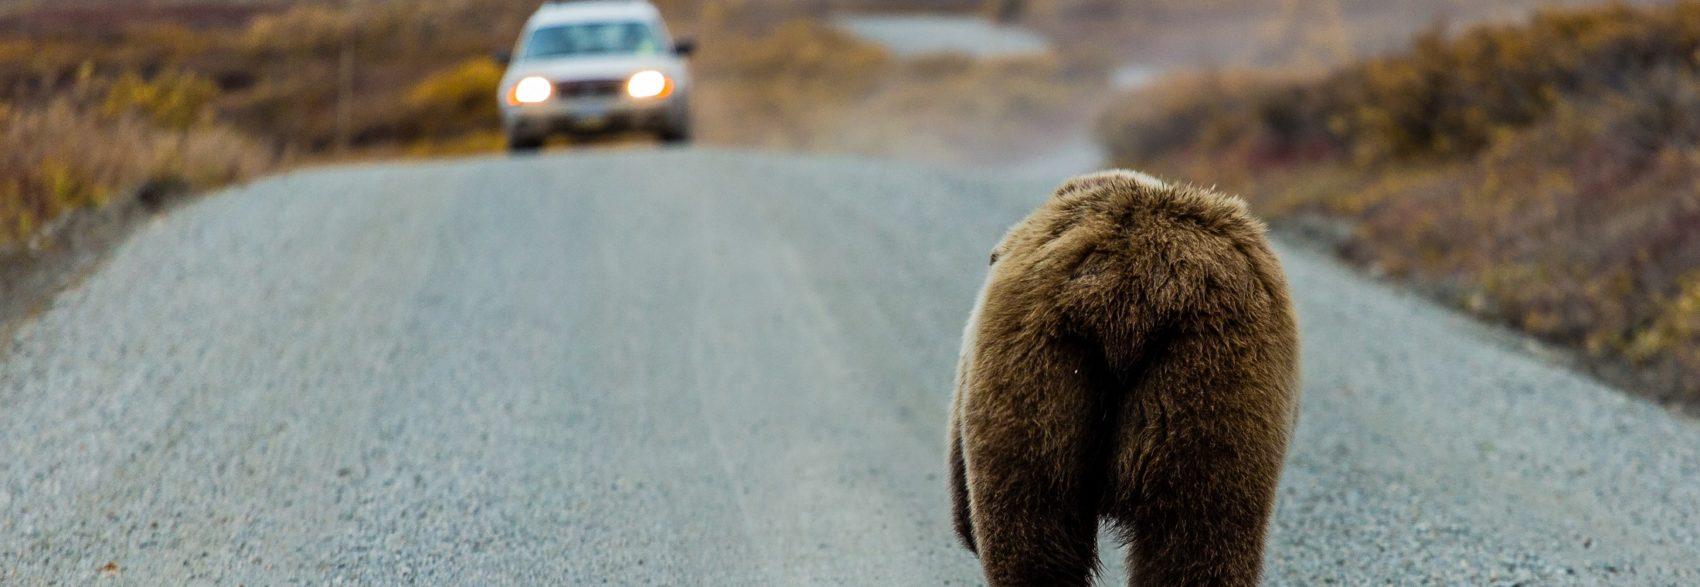 Alaska fly drive holidays